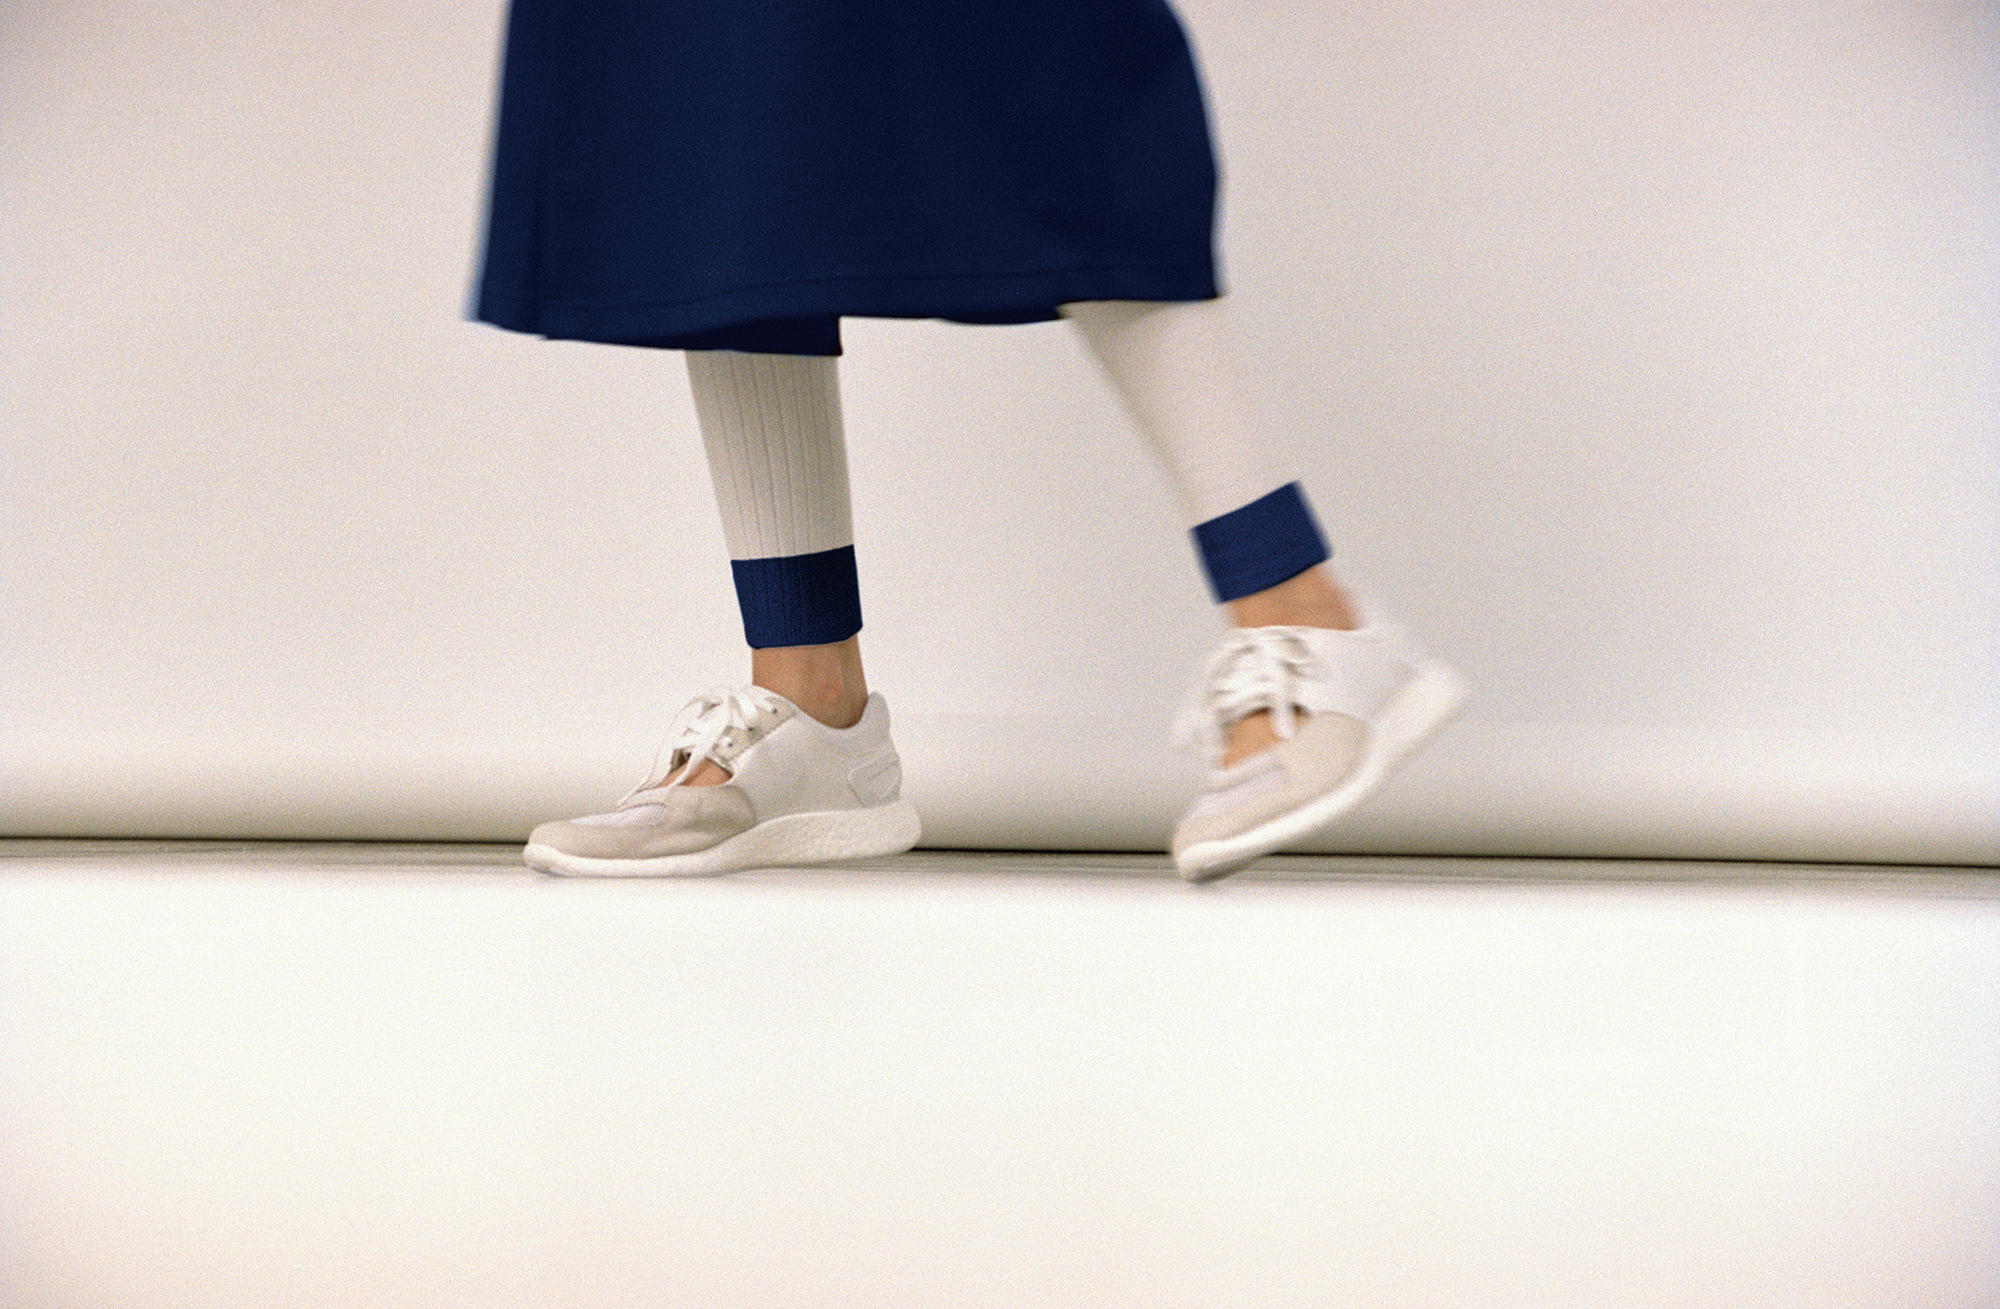 欣赏 adidas Originals by HYKE 2016 春夏联名系列